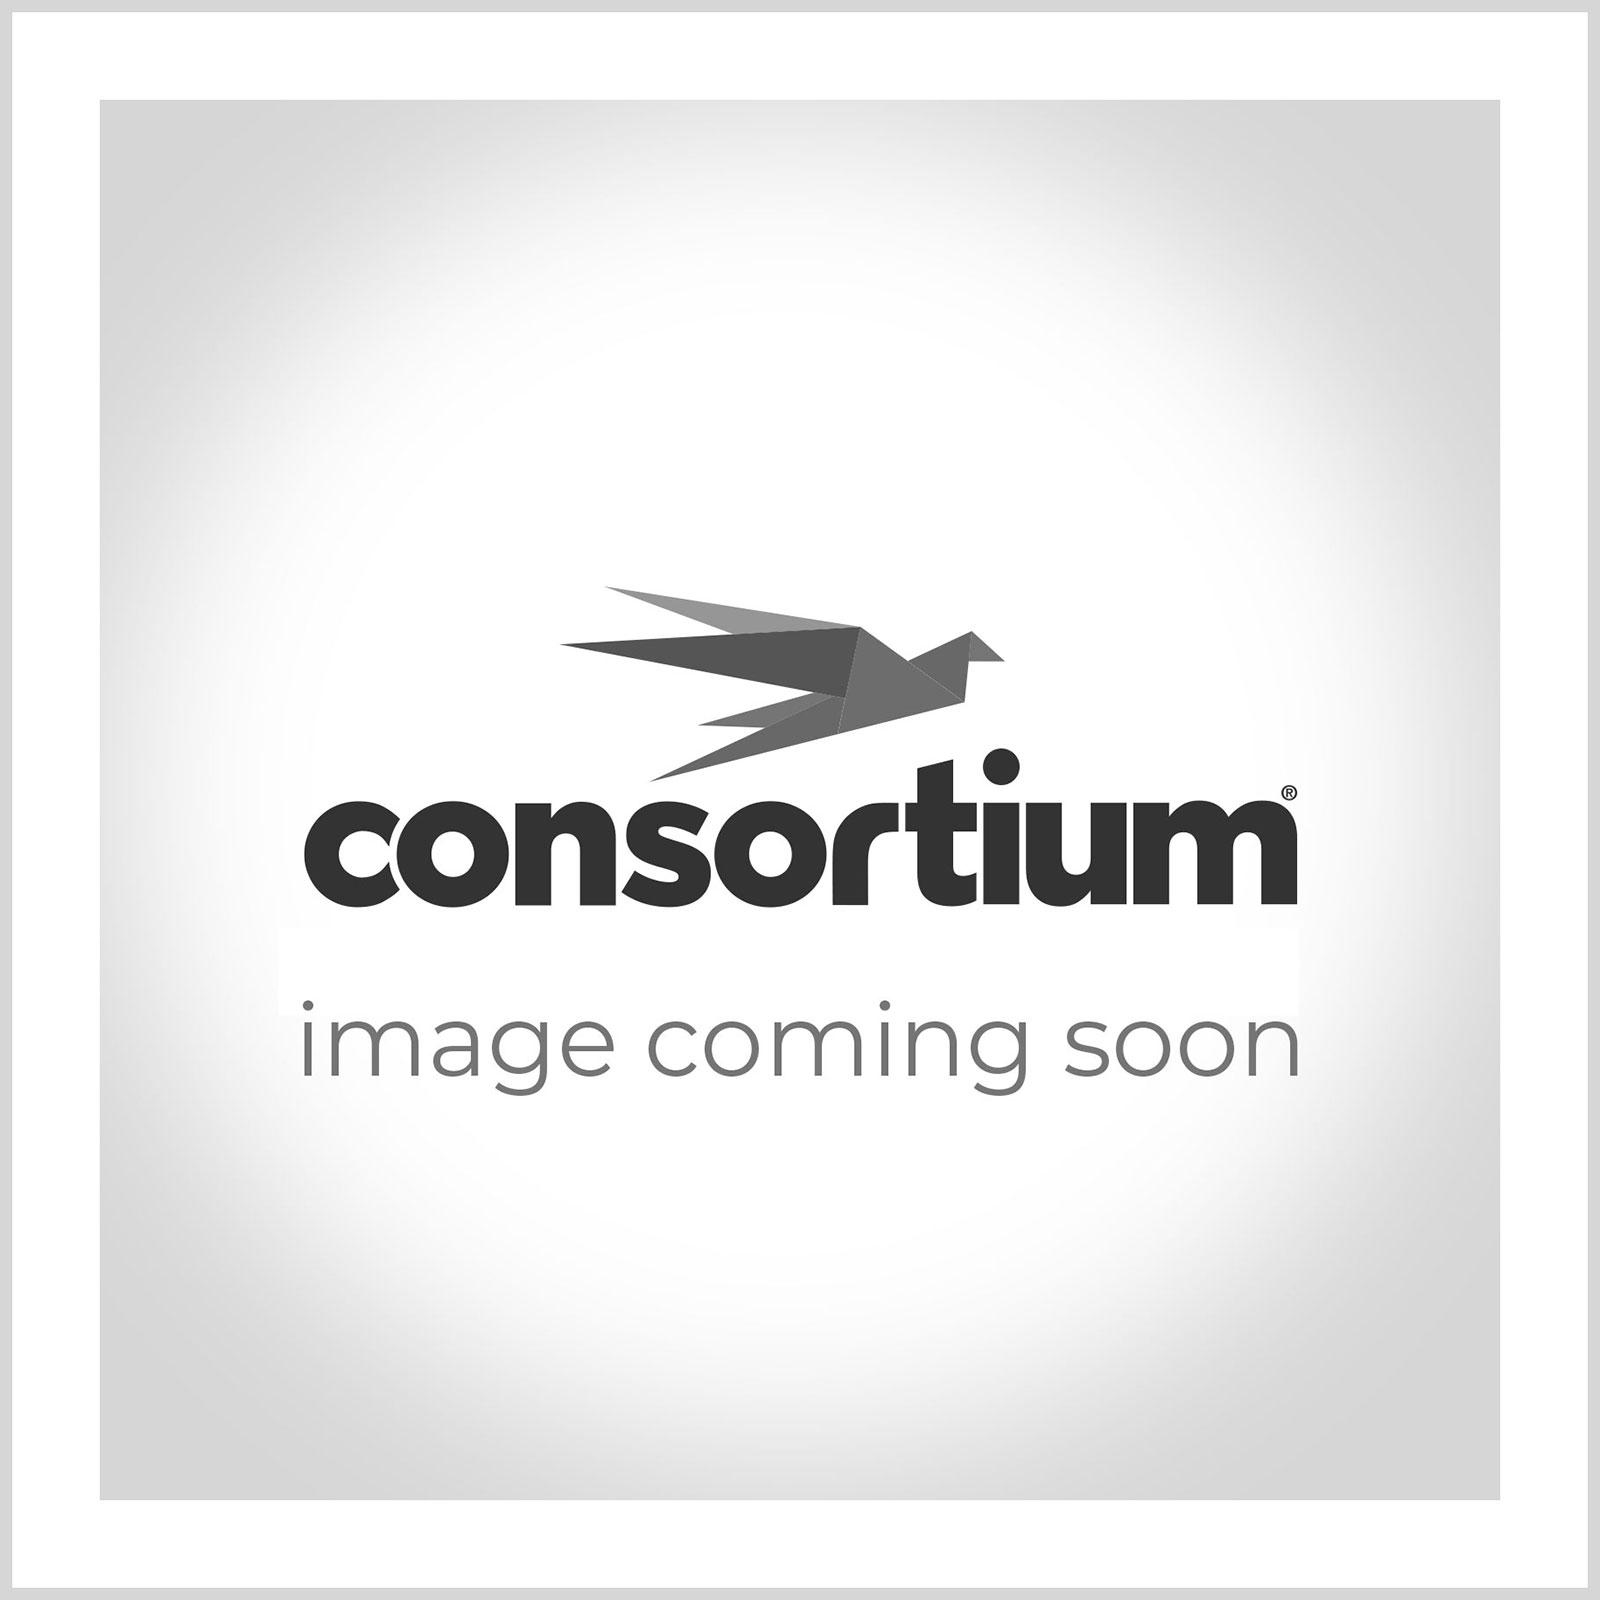 Harrod 3G Original Integral Weighted Small Sided Football Goals